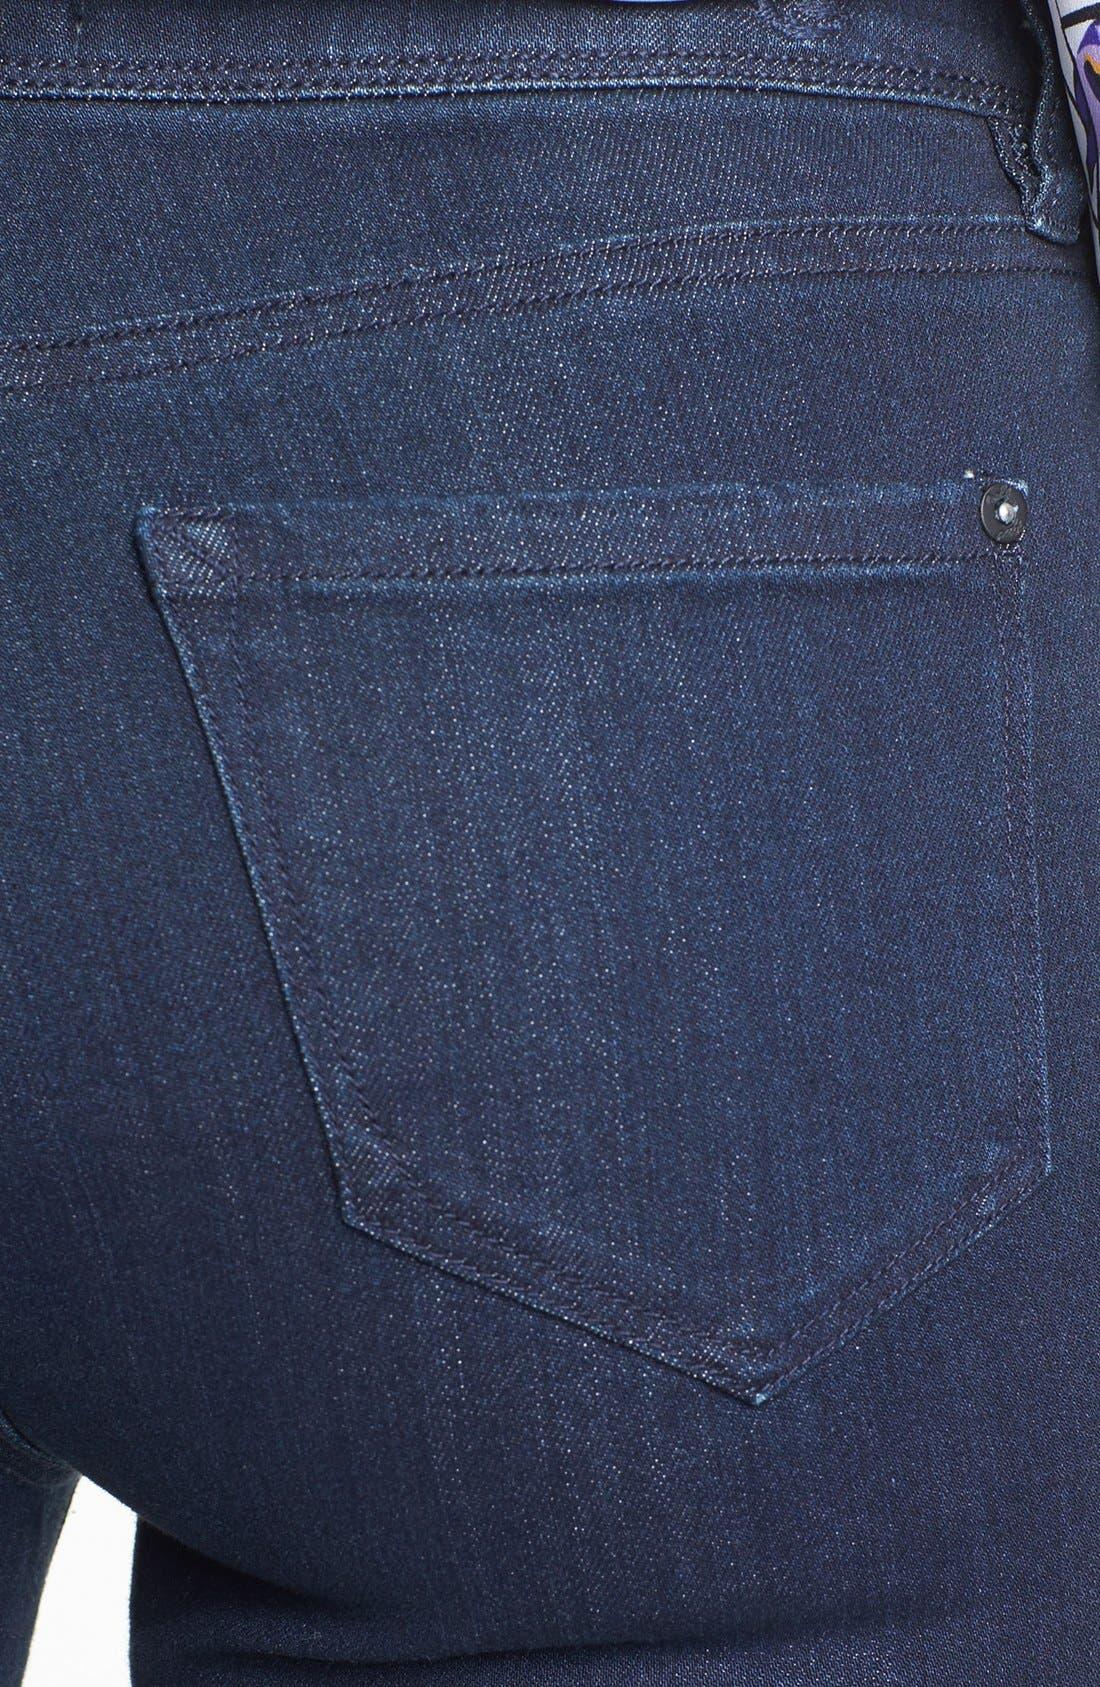 KENSIE,                             'Ankle Biter' High Rise Skinny Jeans,                             Alternate thumbnail 3, color,                             427